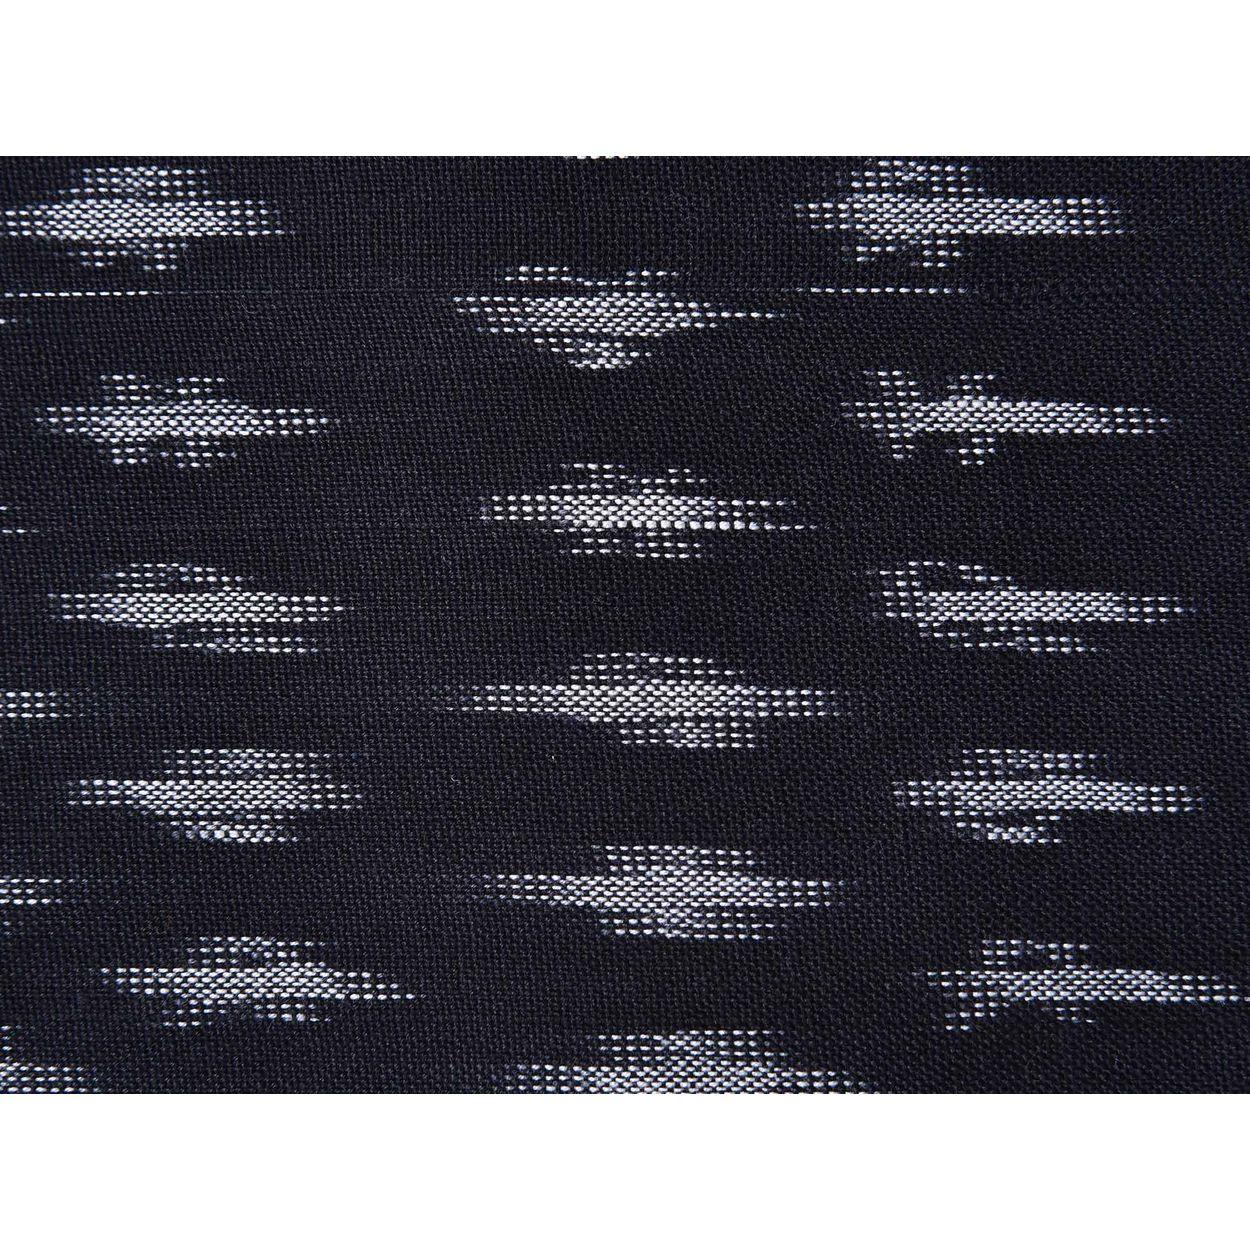 Ikat Cotton Handloom Fabric F0120